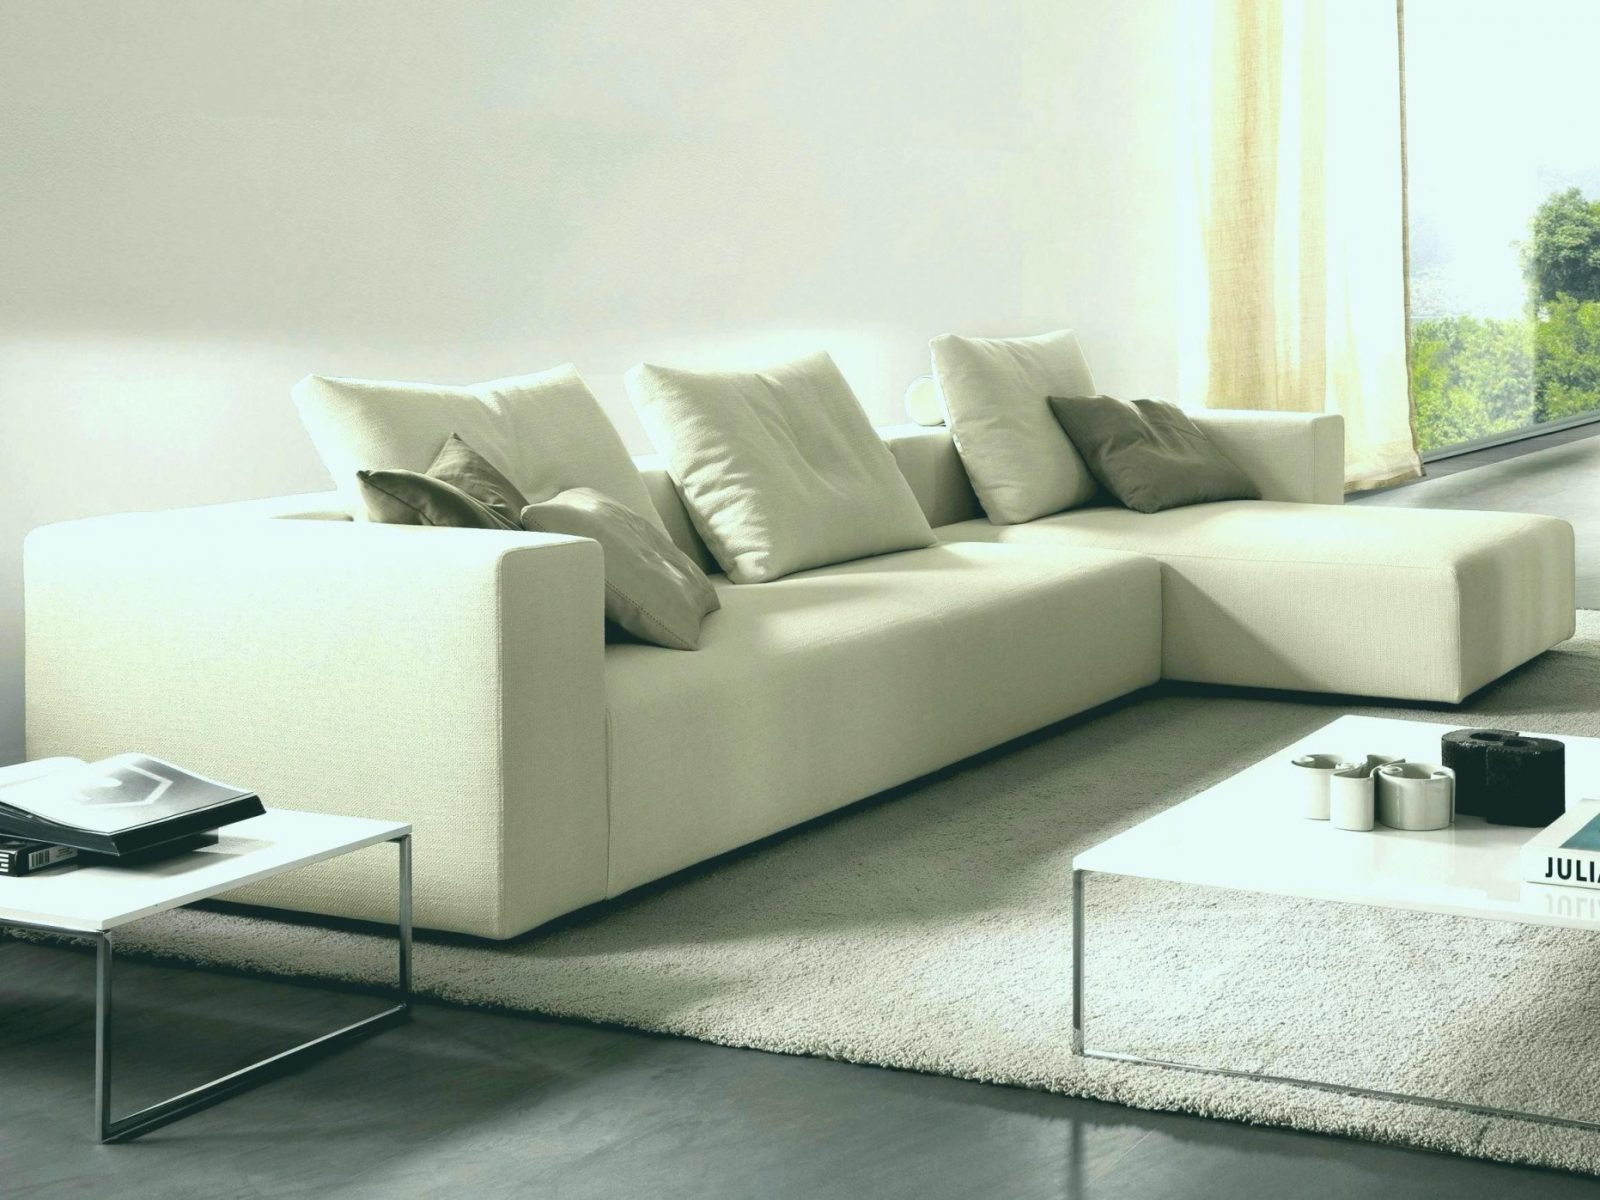 Sofa Bezug Ecksofa Mit Ottomane  Zeitfuermama von Husse Für Ecksofa Mit Ottomane Bild